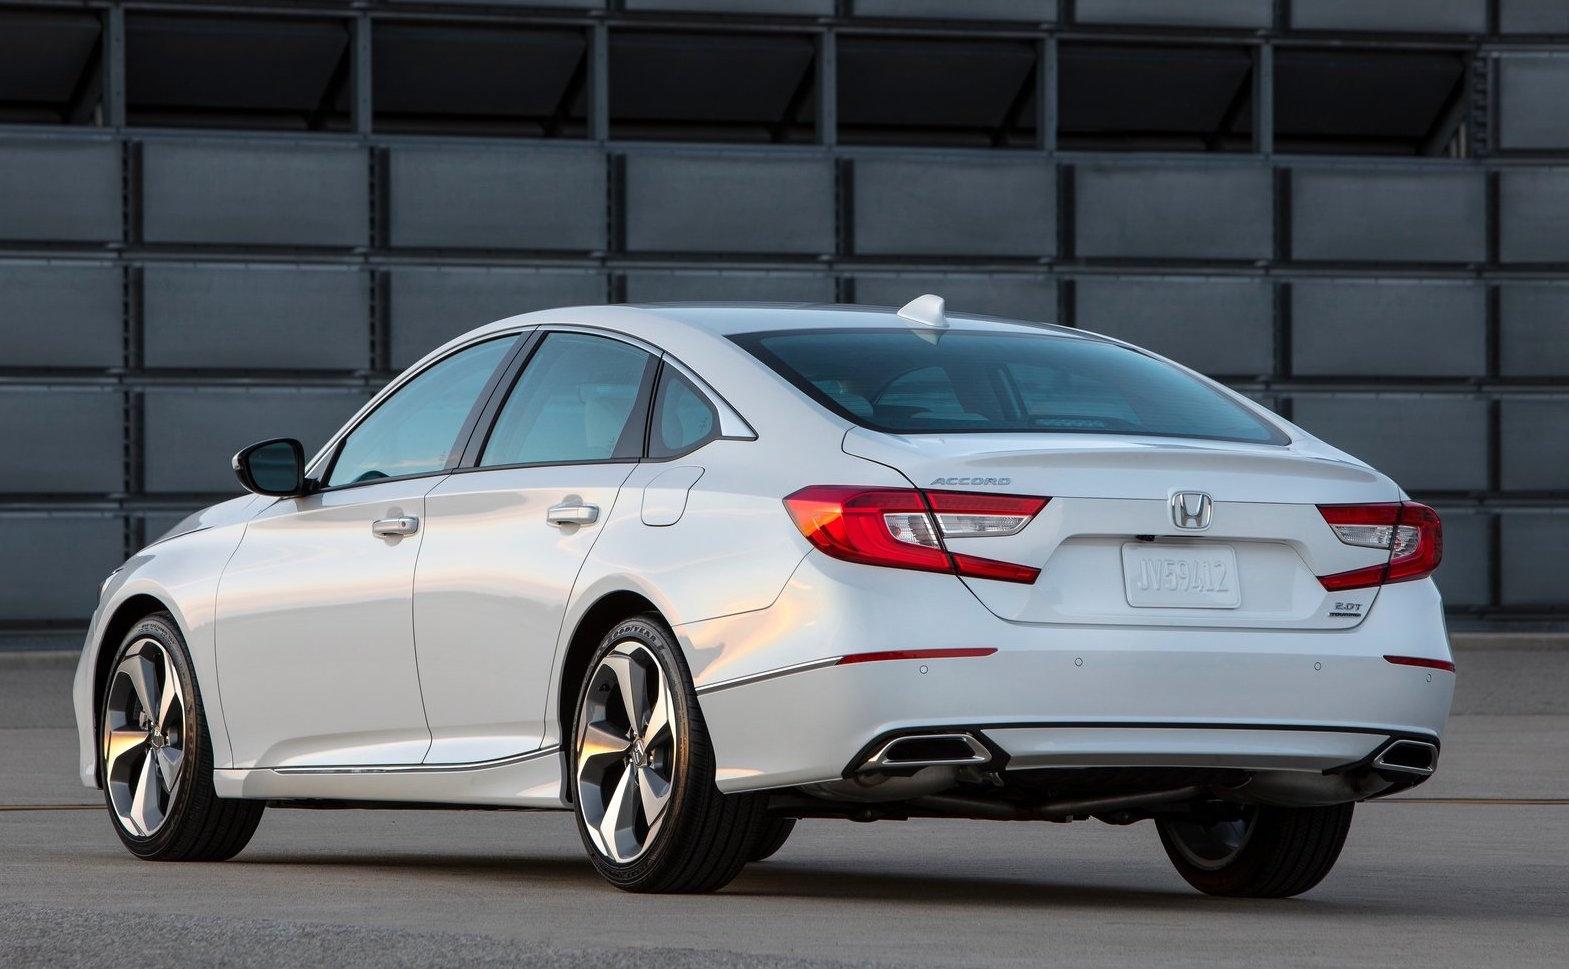 2019 Honda Accord confirmed for Australia, 1.5 turbo ...